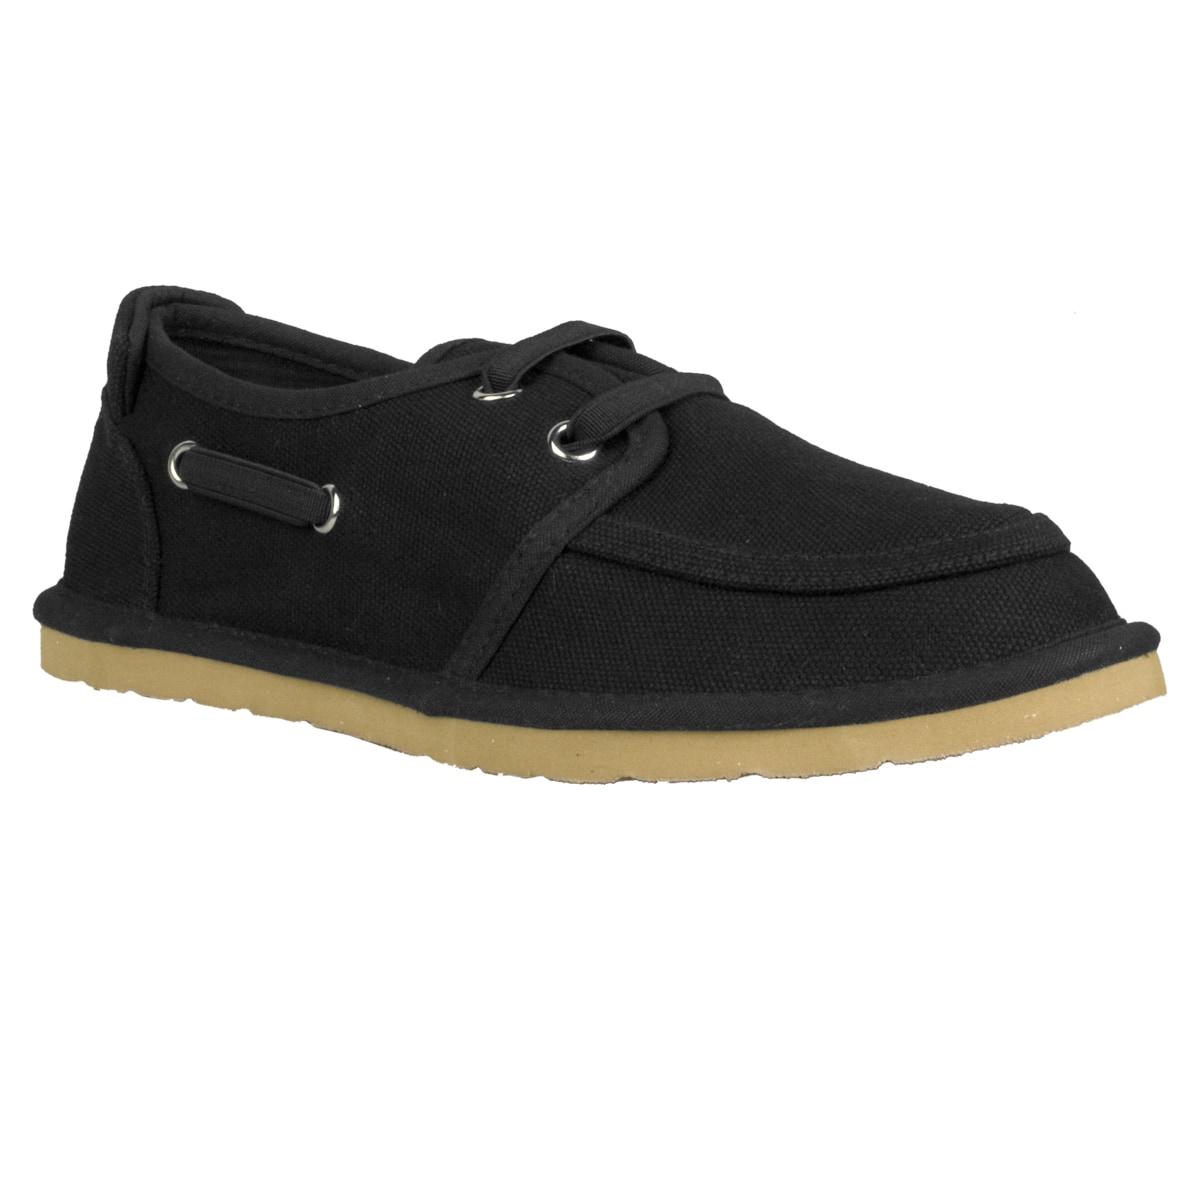 Lugz Men's 'Husk' Black Canvas Slip-on Shoes